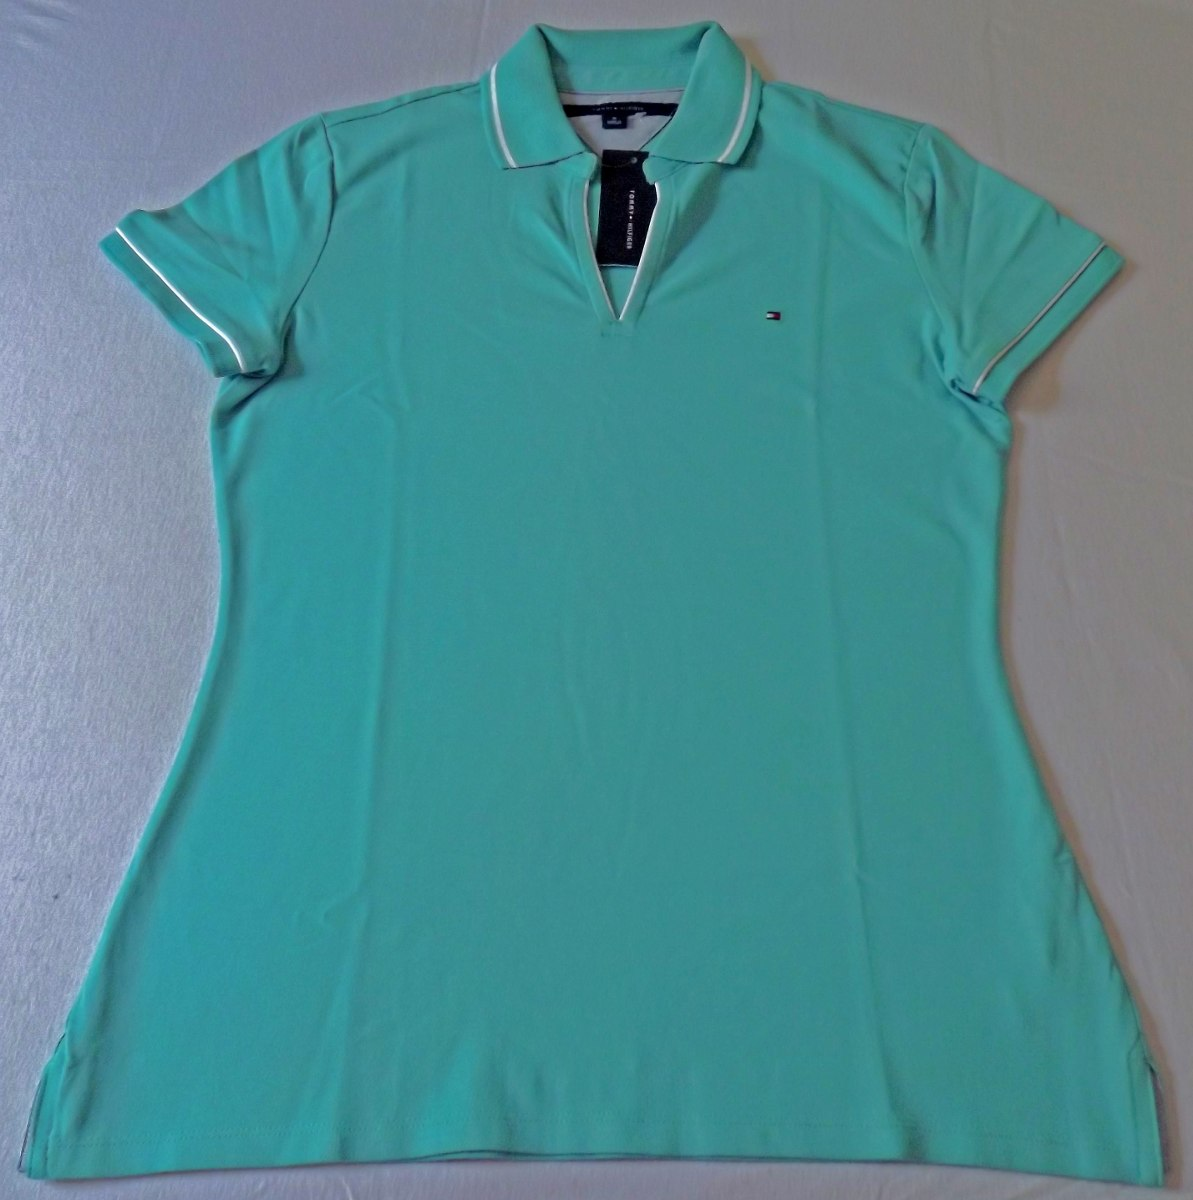 d583c50115ded camiseta polo tommy hilfiger feminina gola v. Carregando zoom.